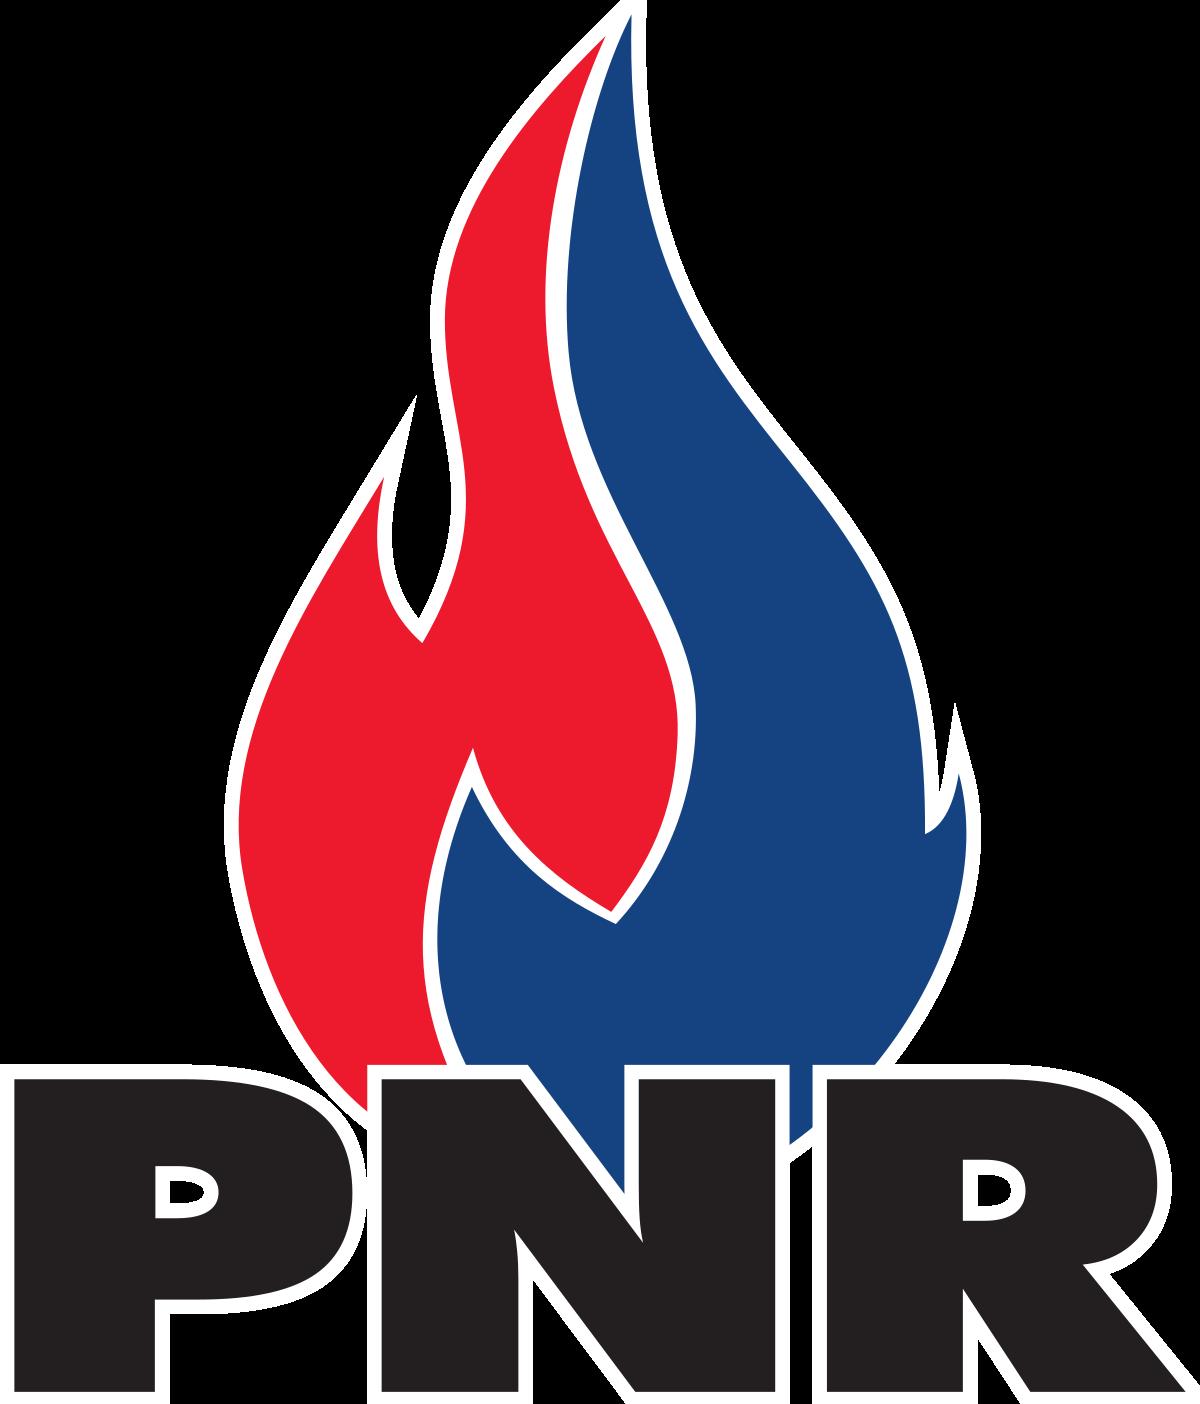 pnr-01